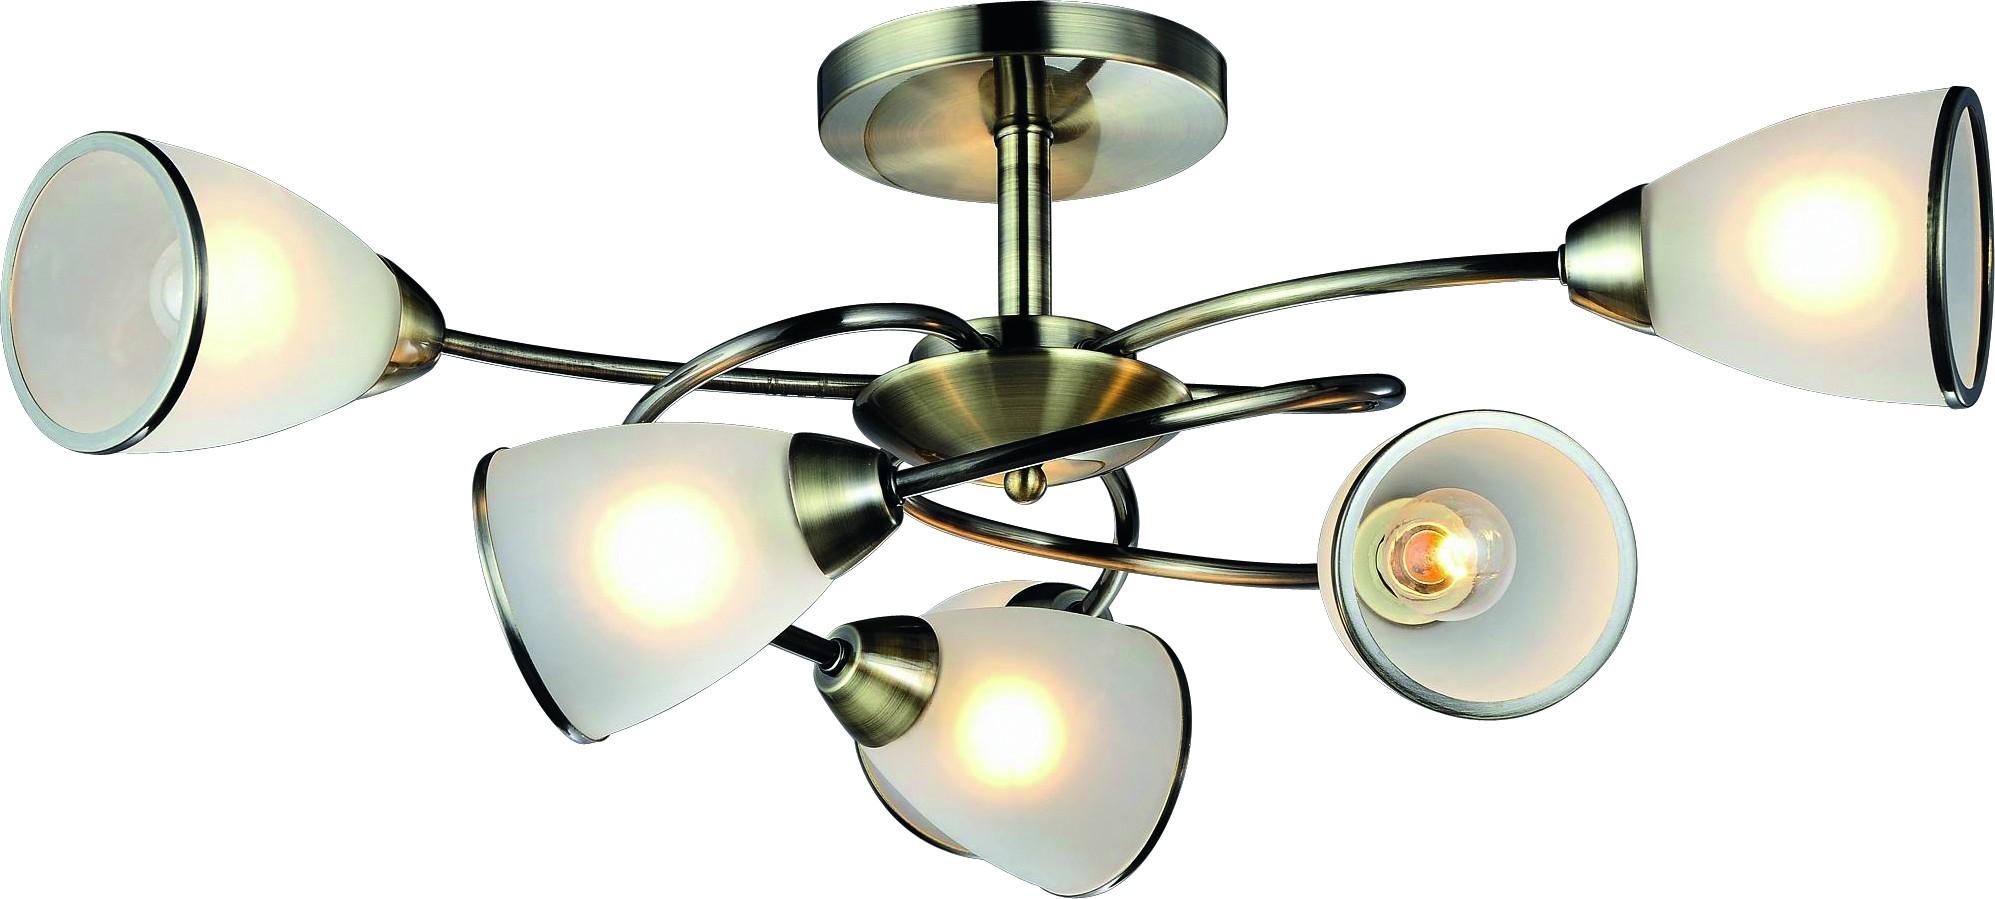 Люстра Arte lamp A6059pl-6ab люстра потолочная ��оллекция zanzibar a8392lm 6ab бронза arte lamp арте ламп